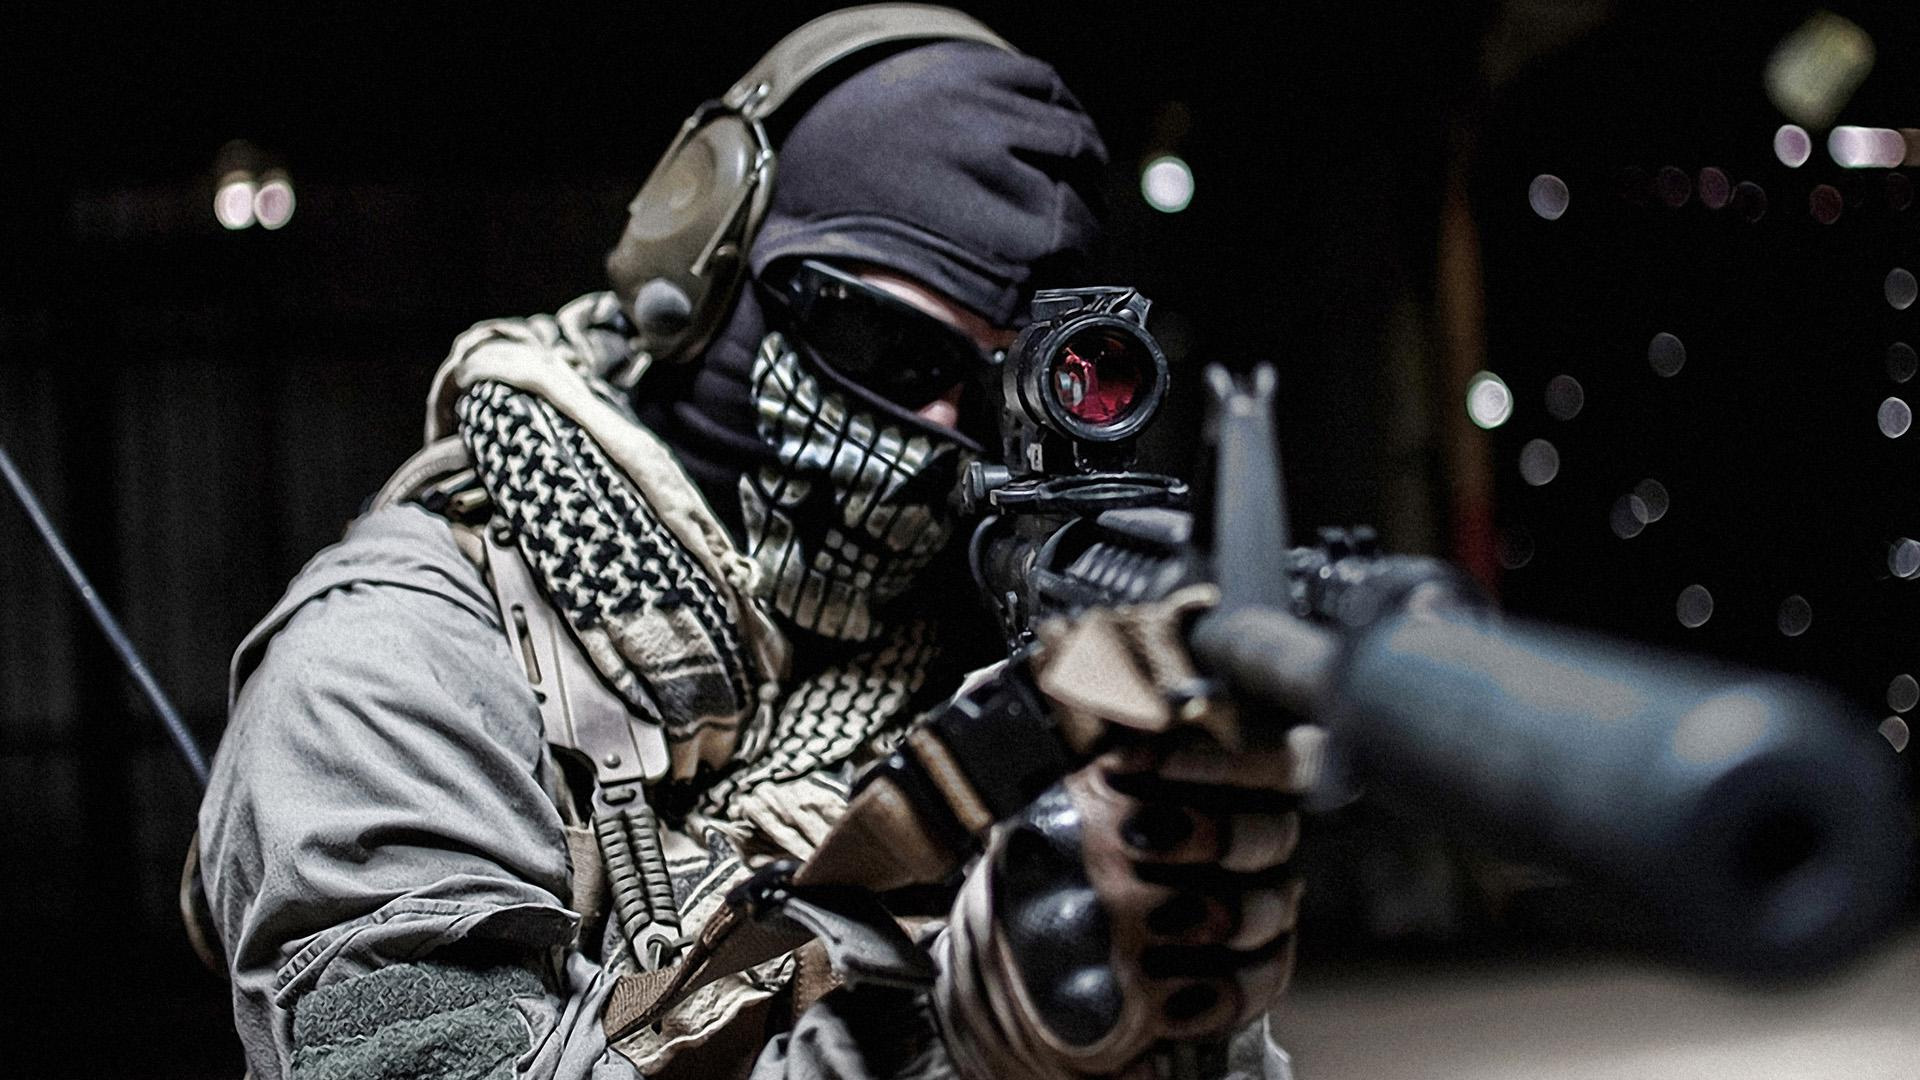 Killzone Shadow Fall Mobile Wallpaper Call Of Duty Wallpaper 1920x1080 42703